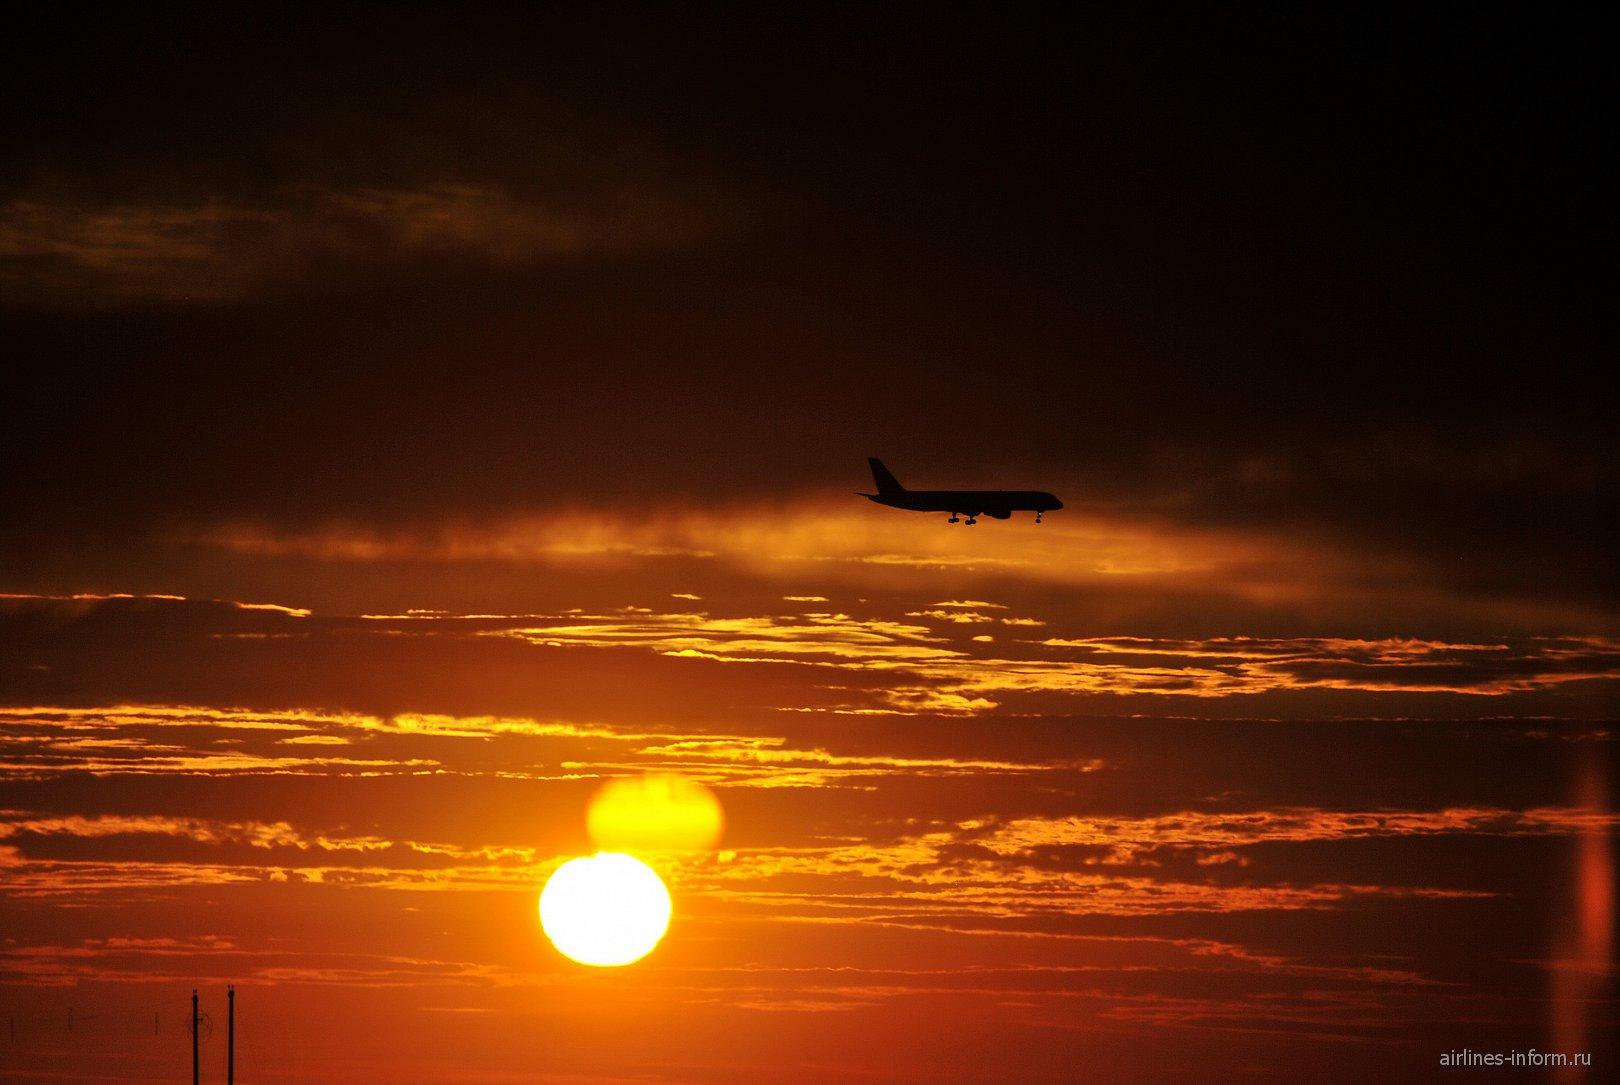 Боинг-757-200 ВИМ-авиа на закате в аэропорту Симферополь